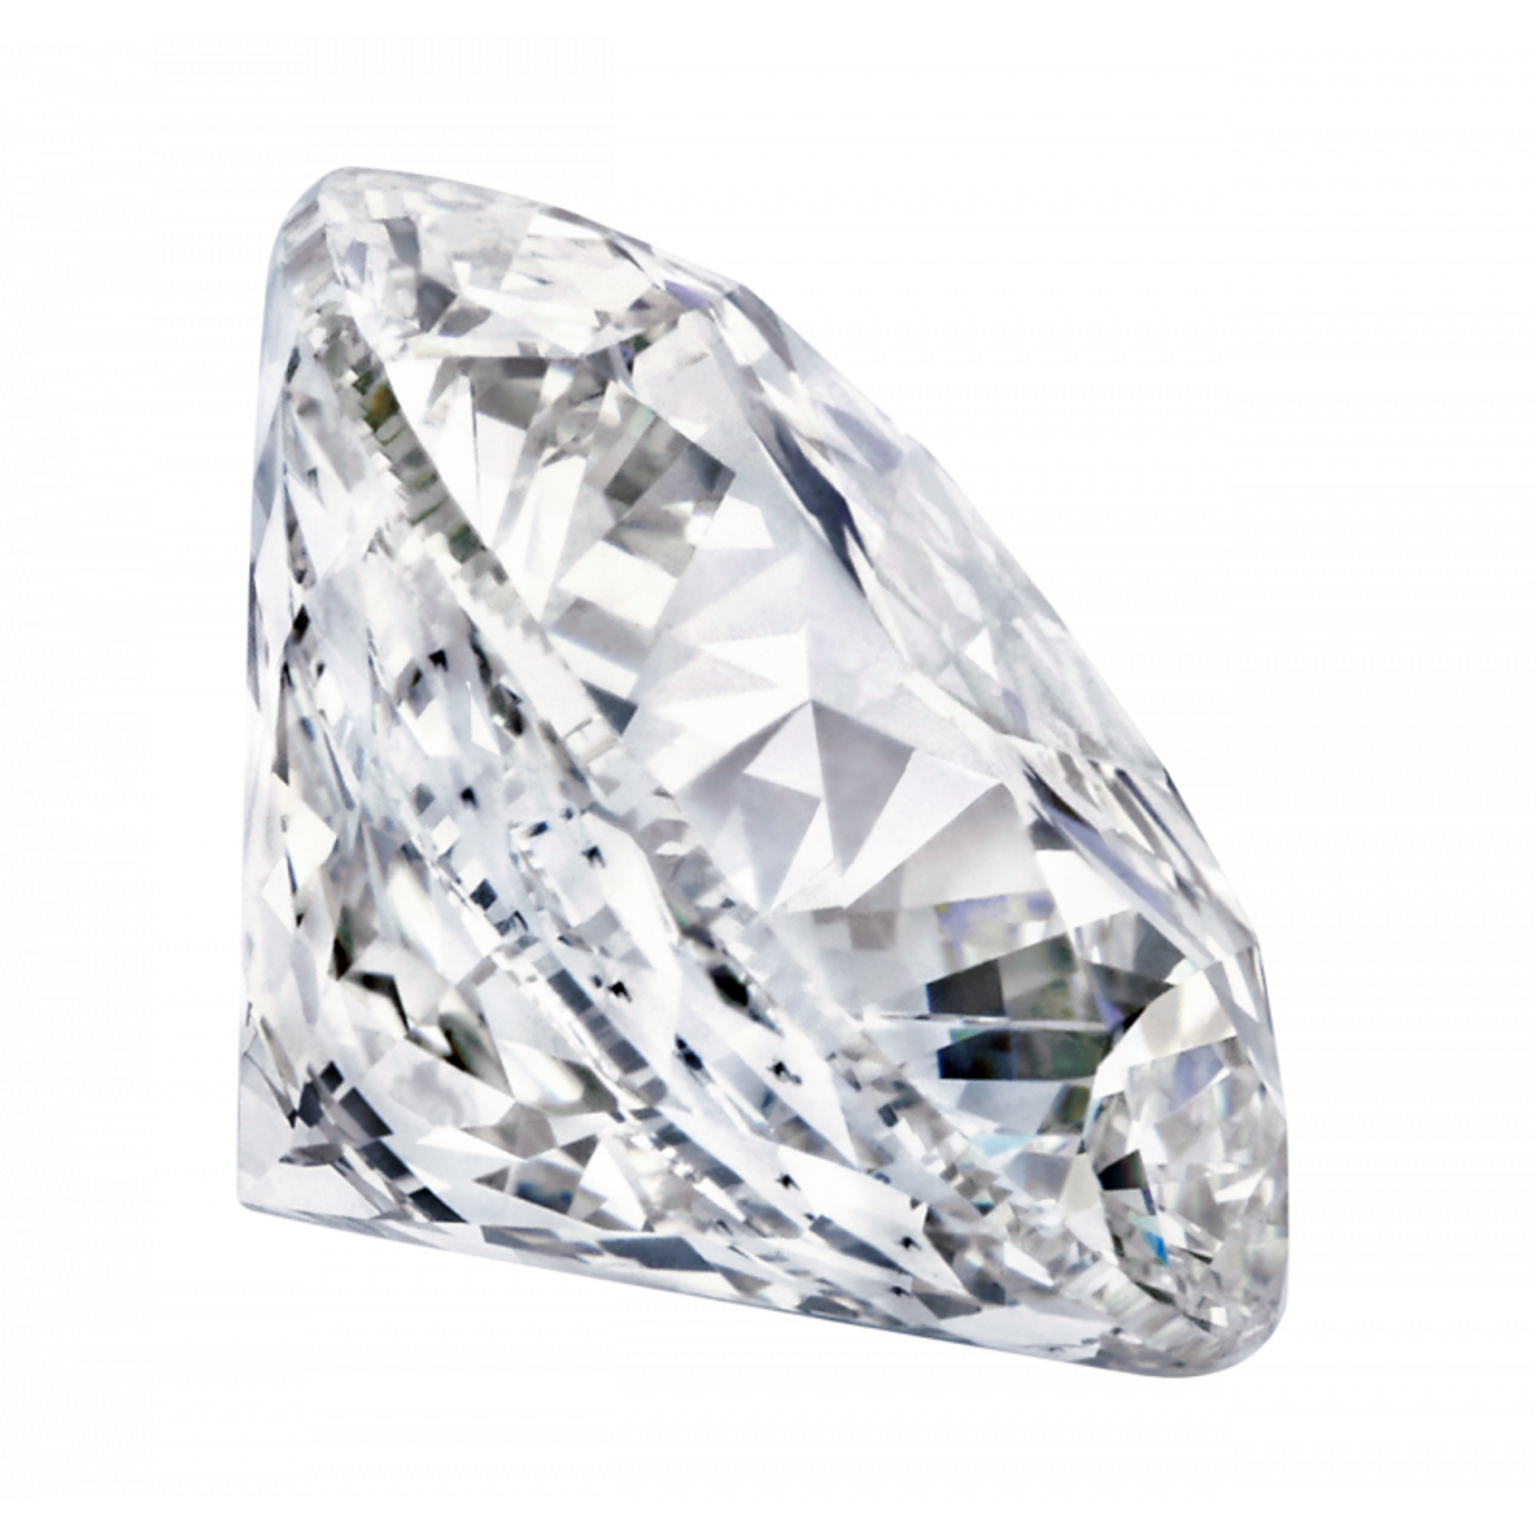 GASSAN 121 ® cut diamond